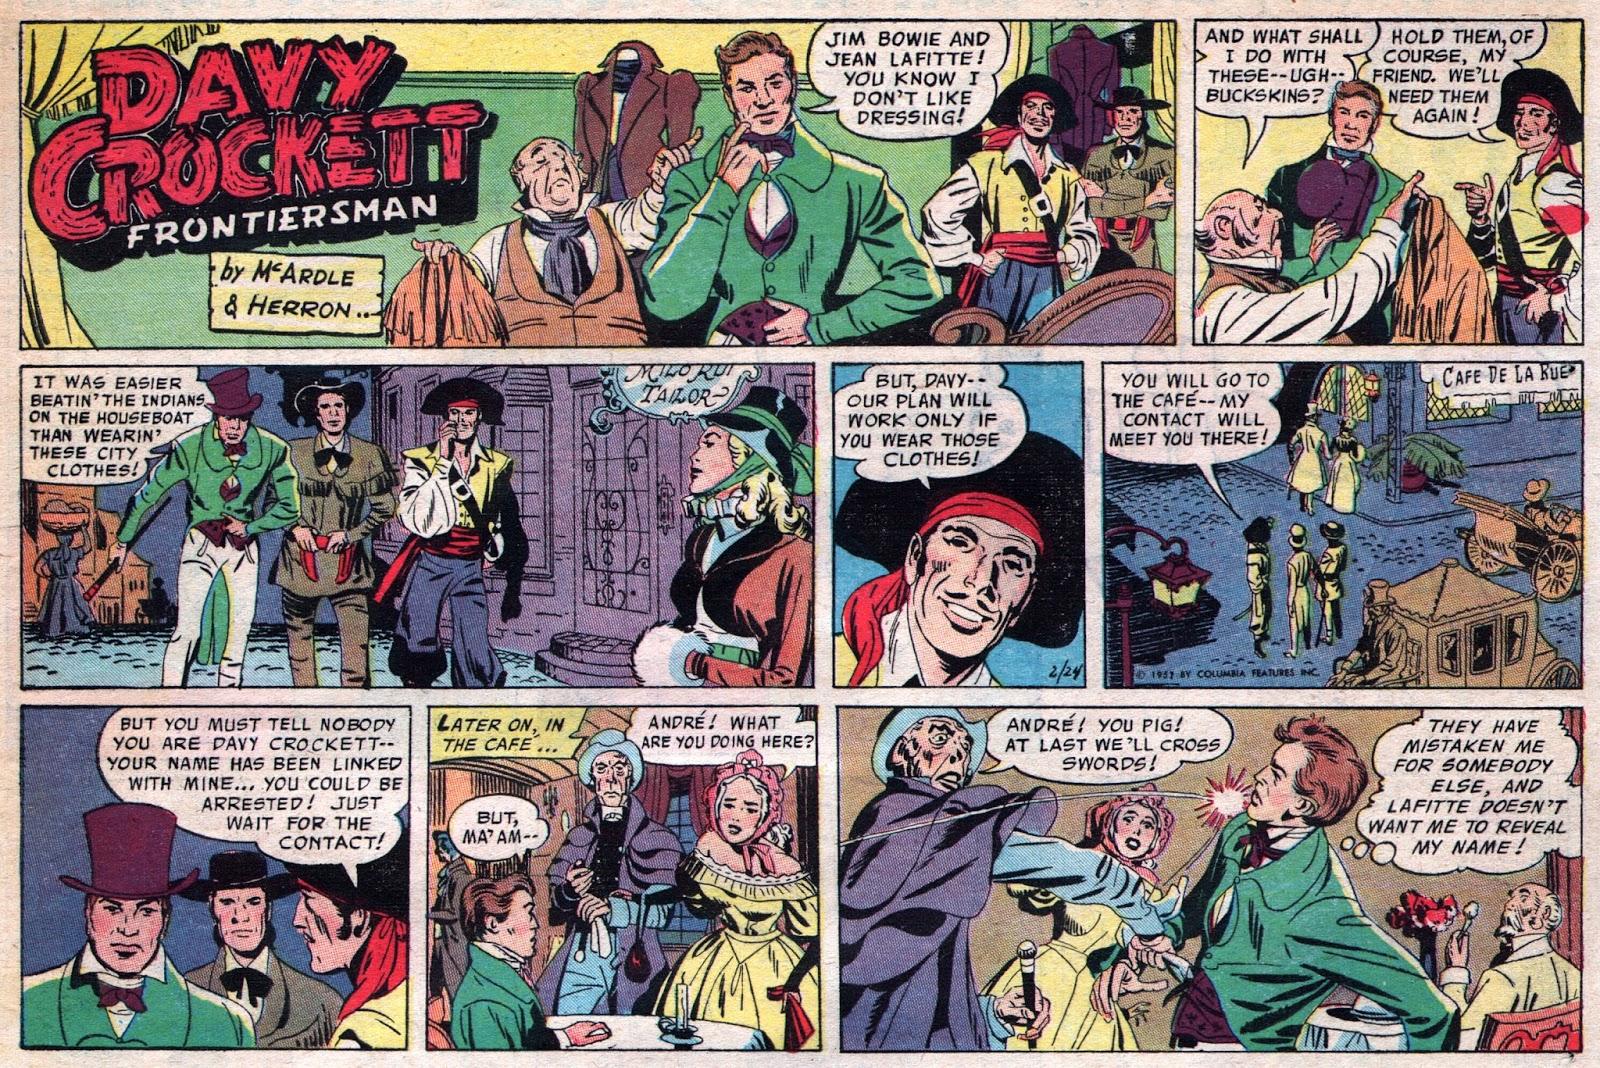 24 February 1957 Davy Crockett, Frontiersman Sunday strip